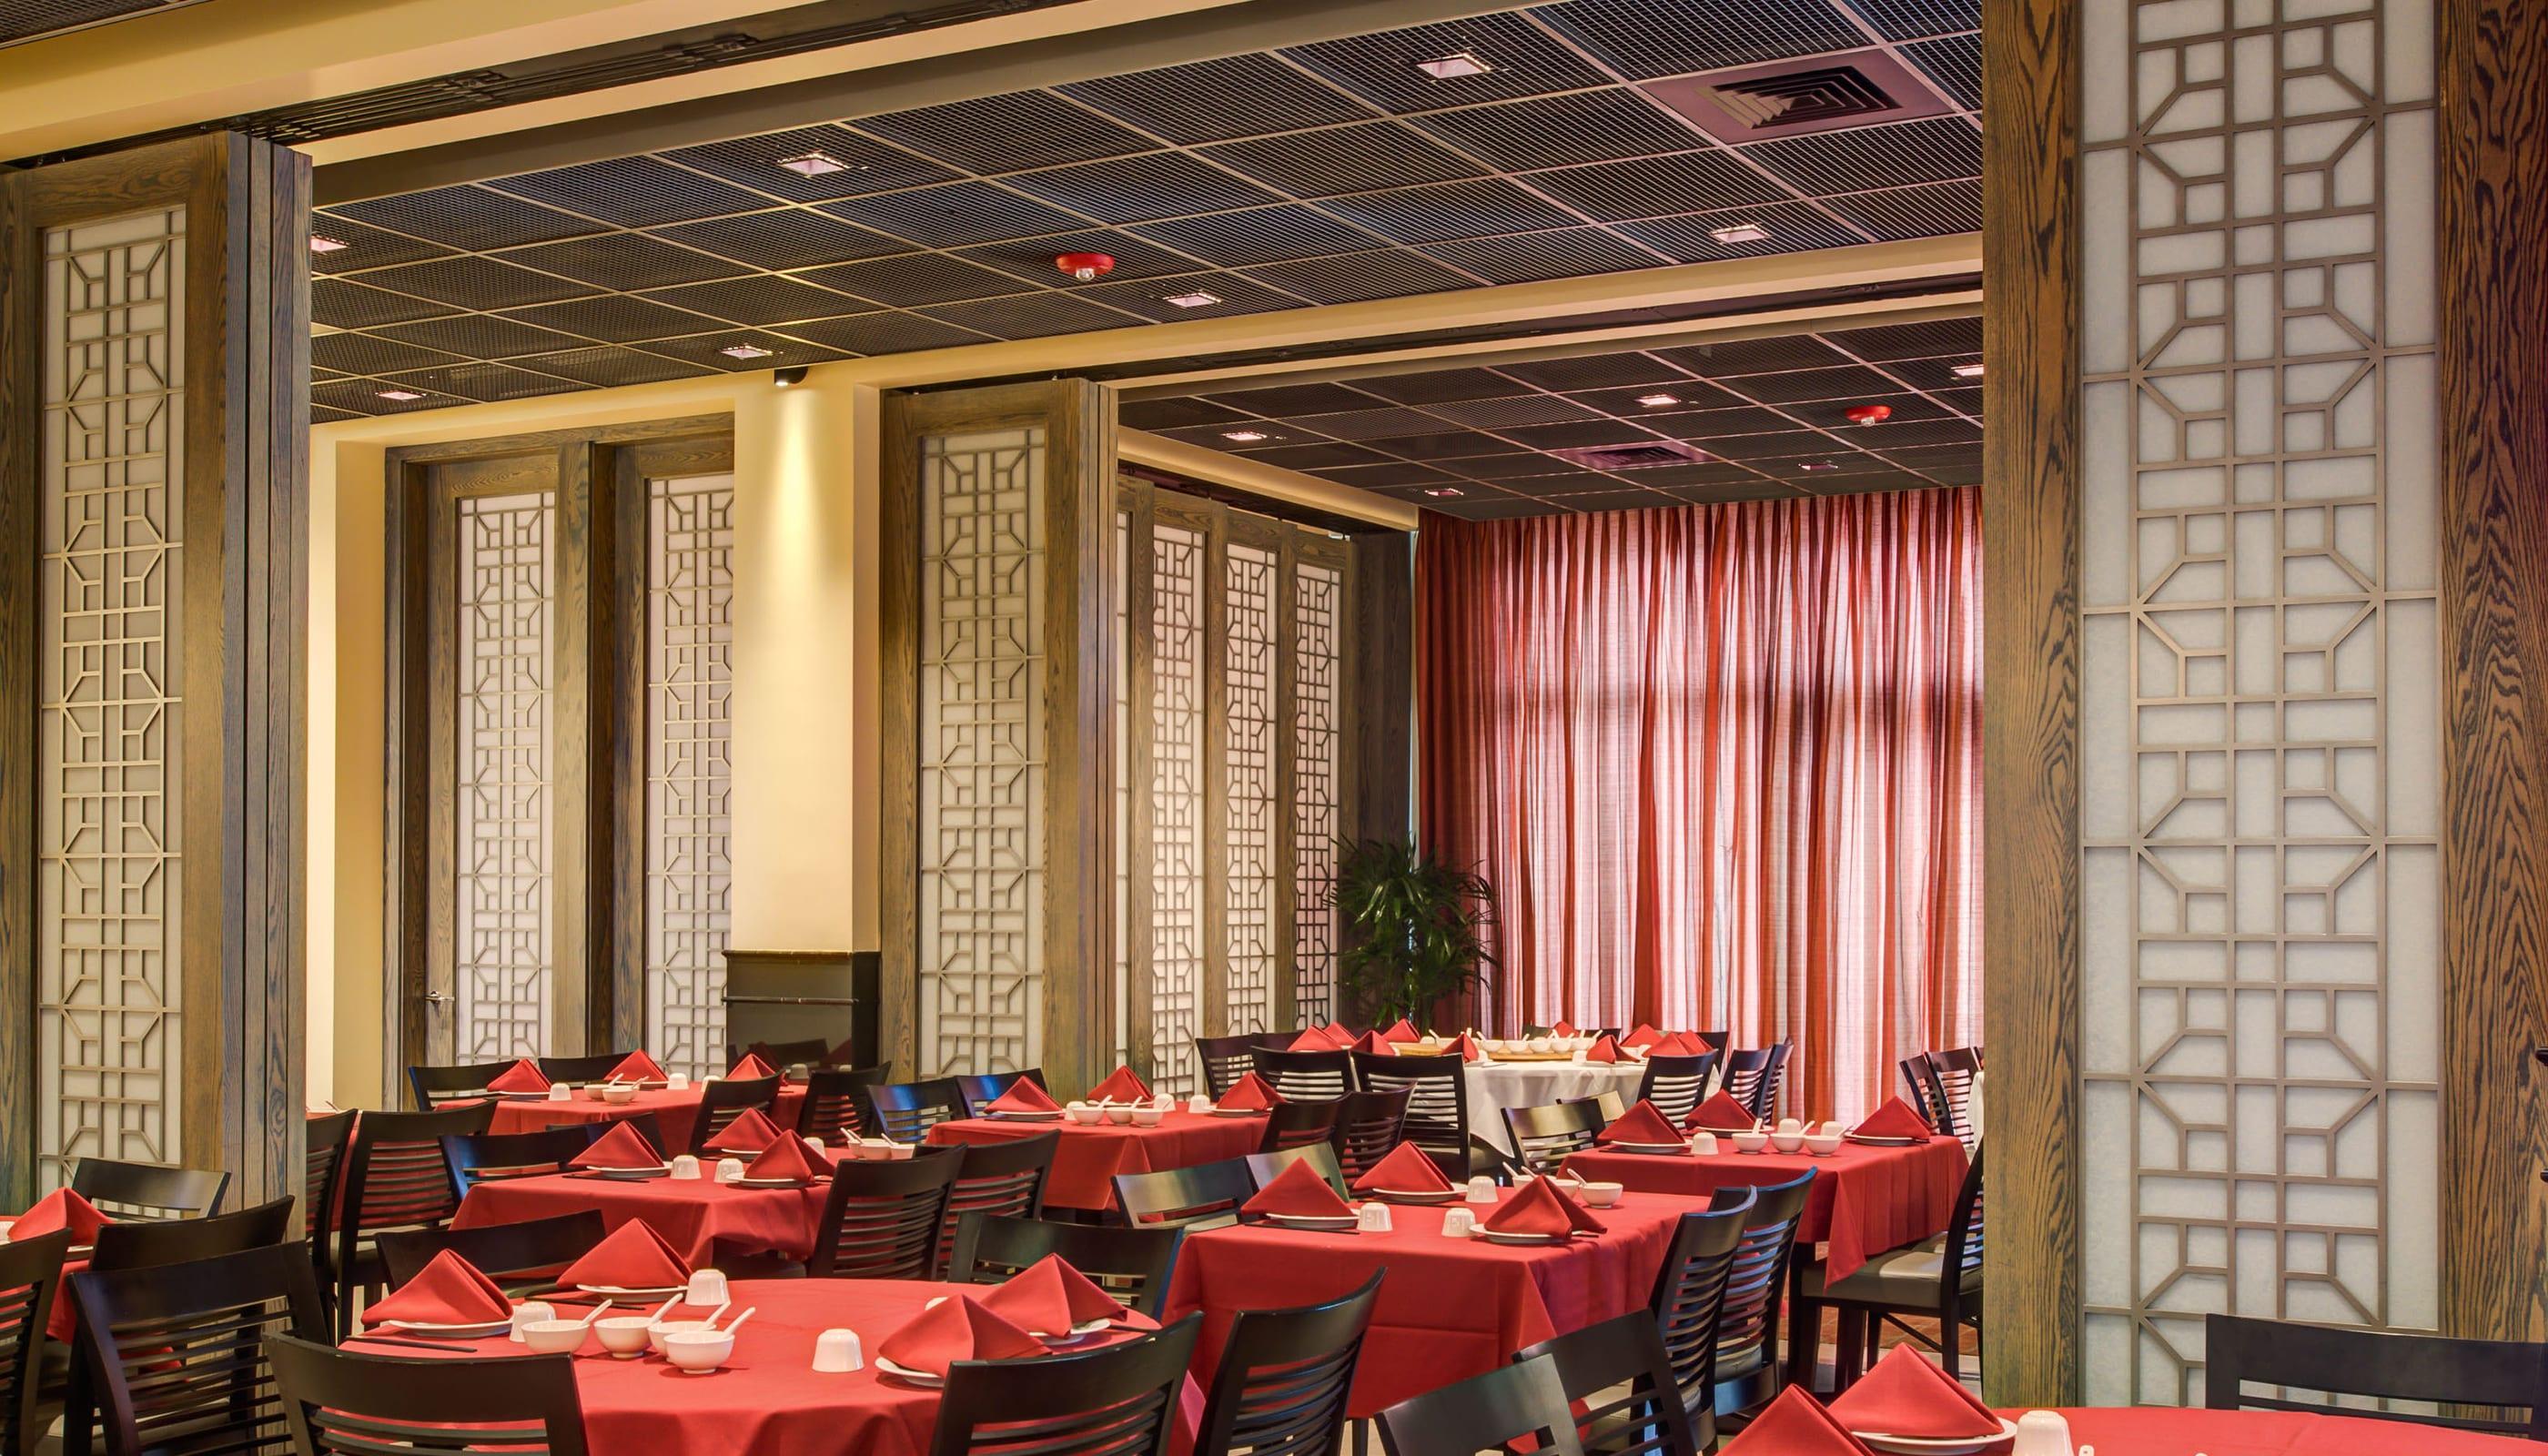 Mayflower Restaurant - Commercial Architecture